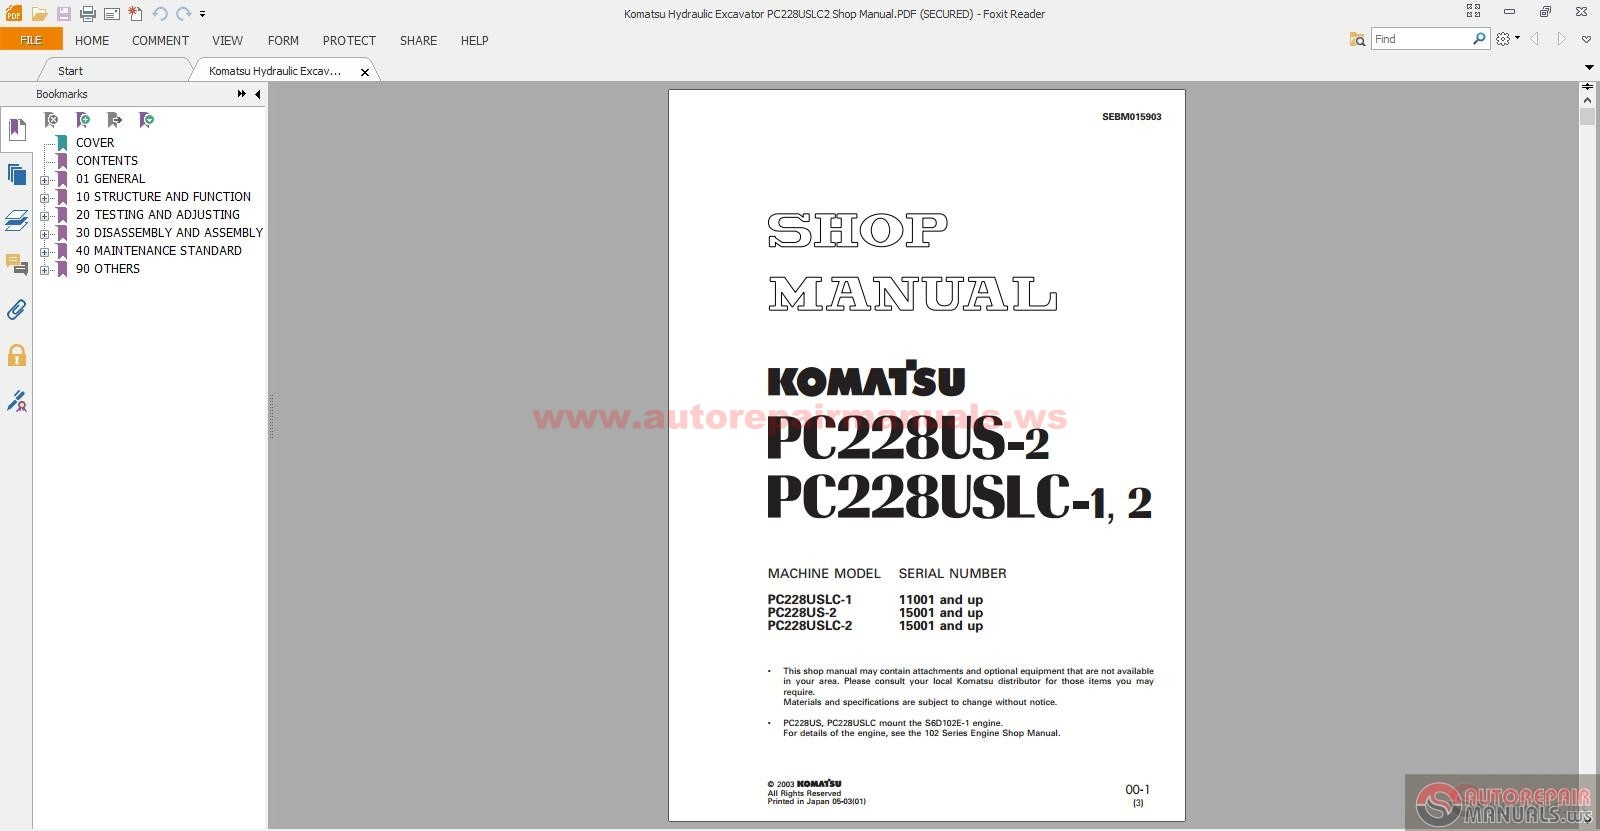 komatsu hydraulic excavator pc228uslc2 shop manual auto. Black Bedroom Furniture Sets. Home Design Ideas